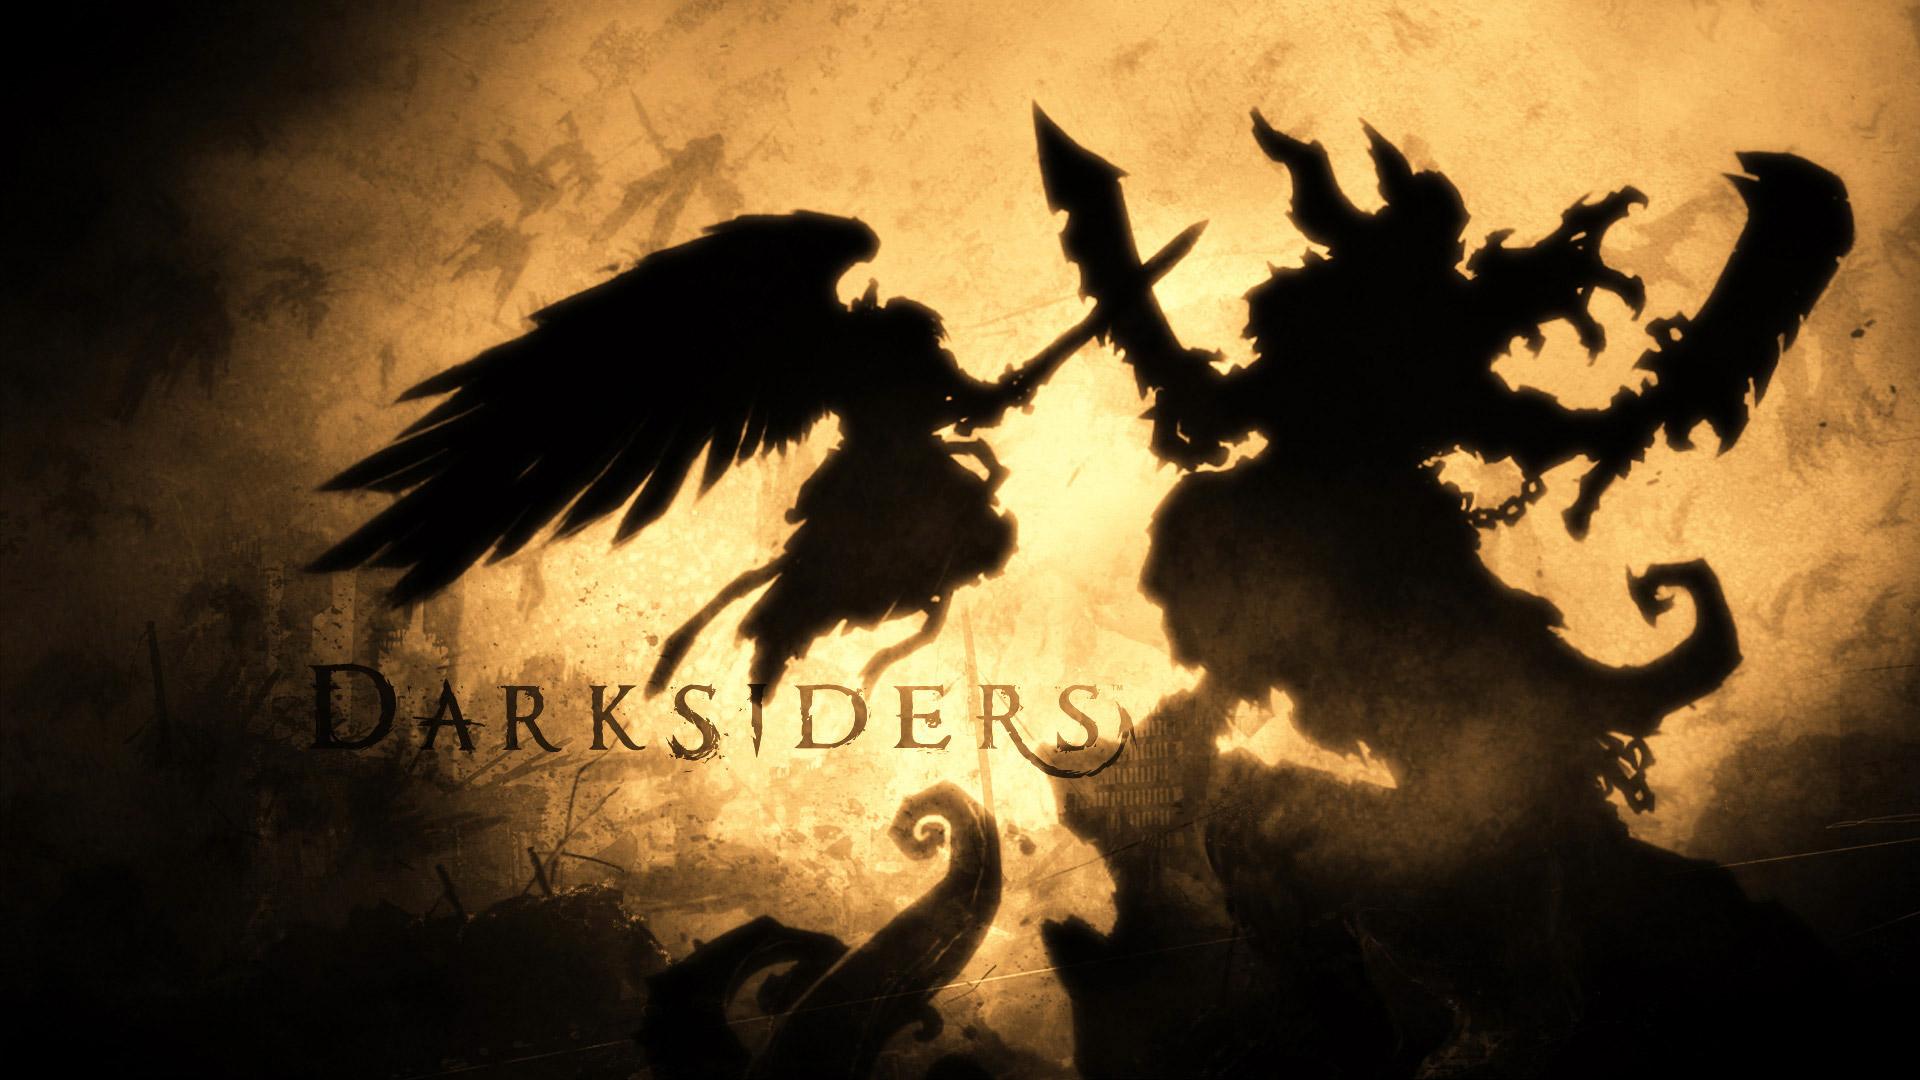 Free Darksiders Wallpaper in 1920x1080